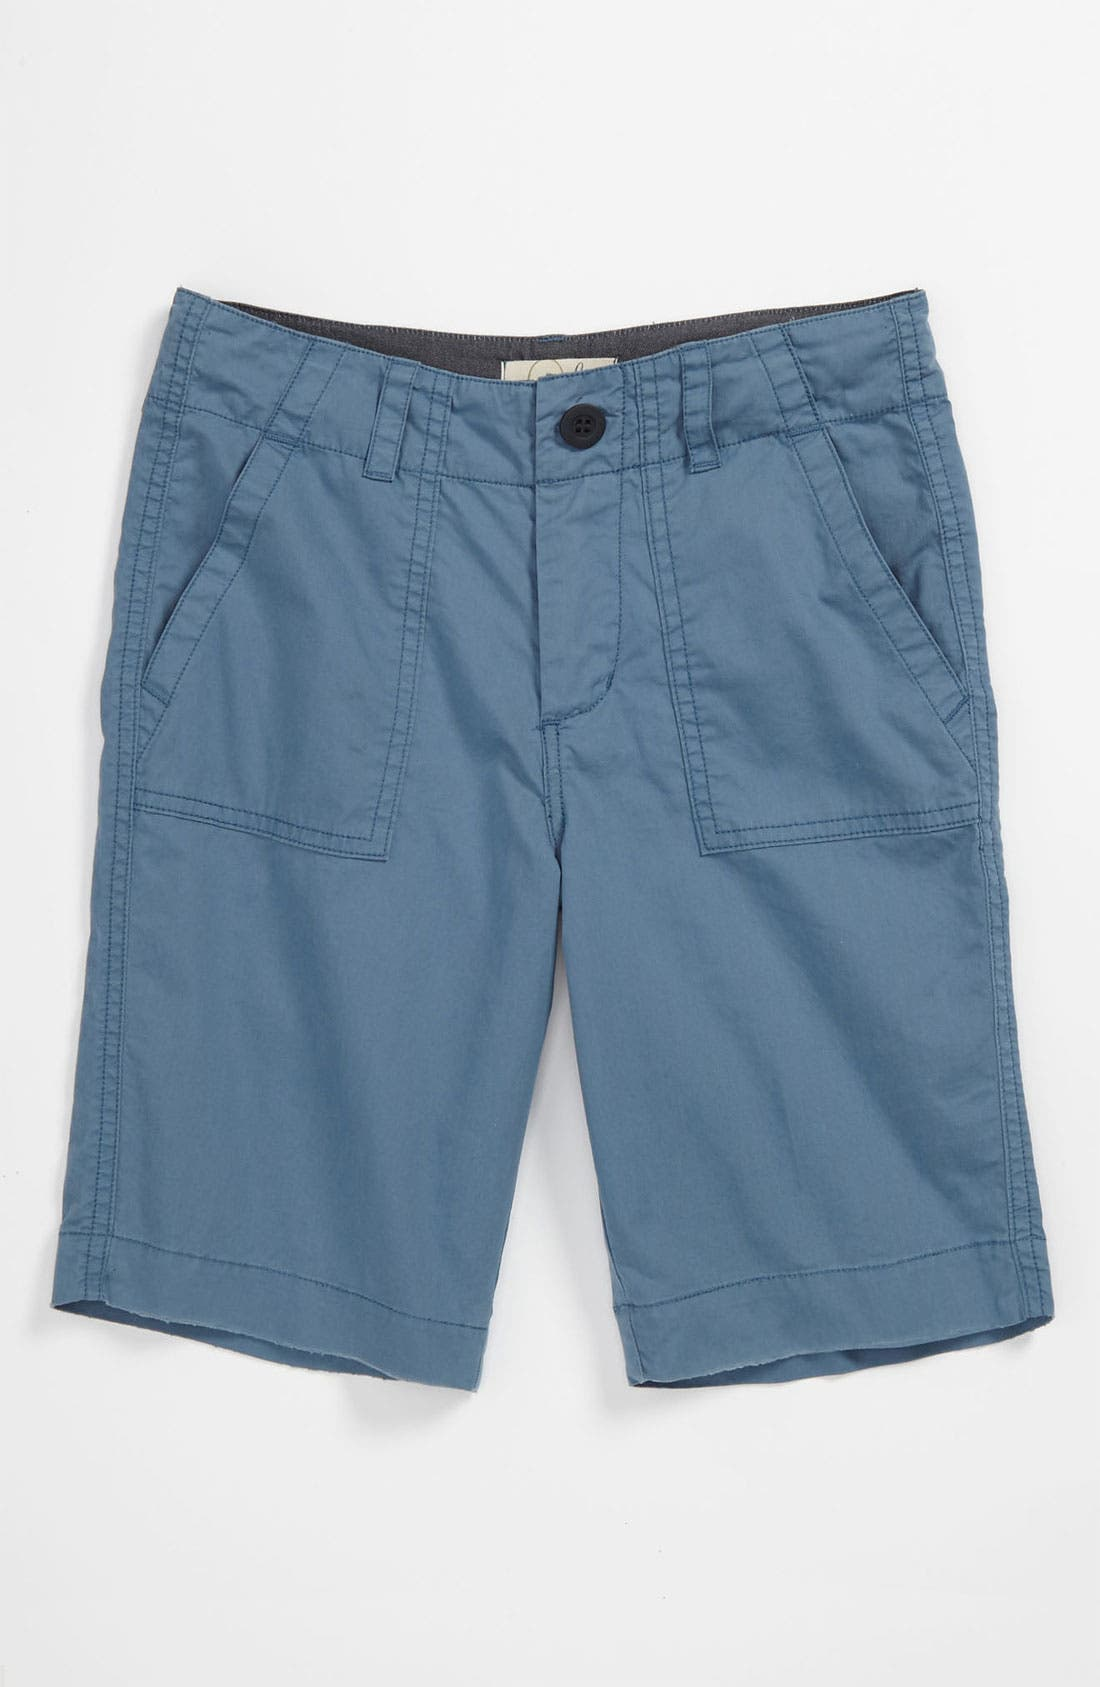 Main Image - Peek 'Jericho' Utility Shorts (Toddler Boys, Little Boys & Big Boys)